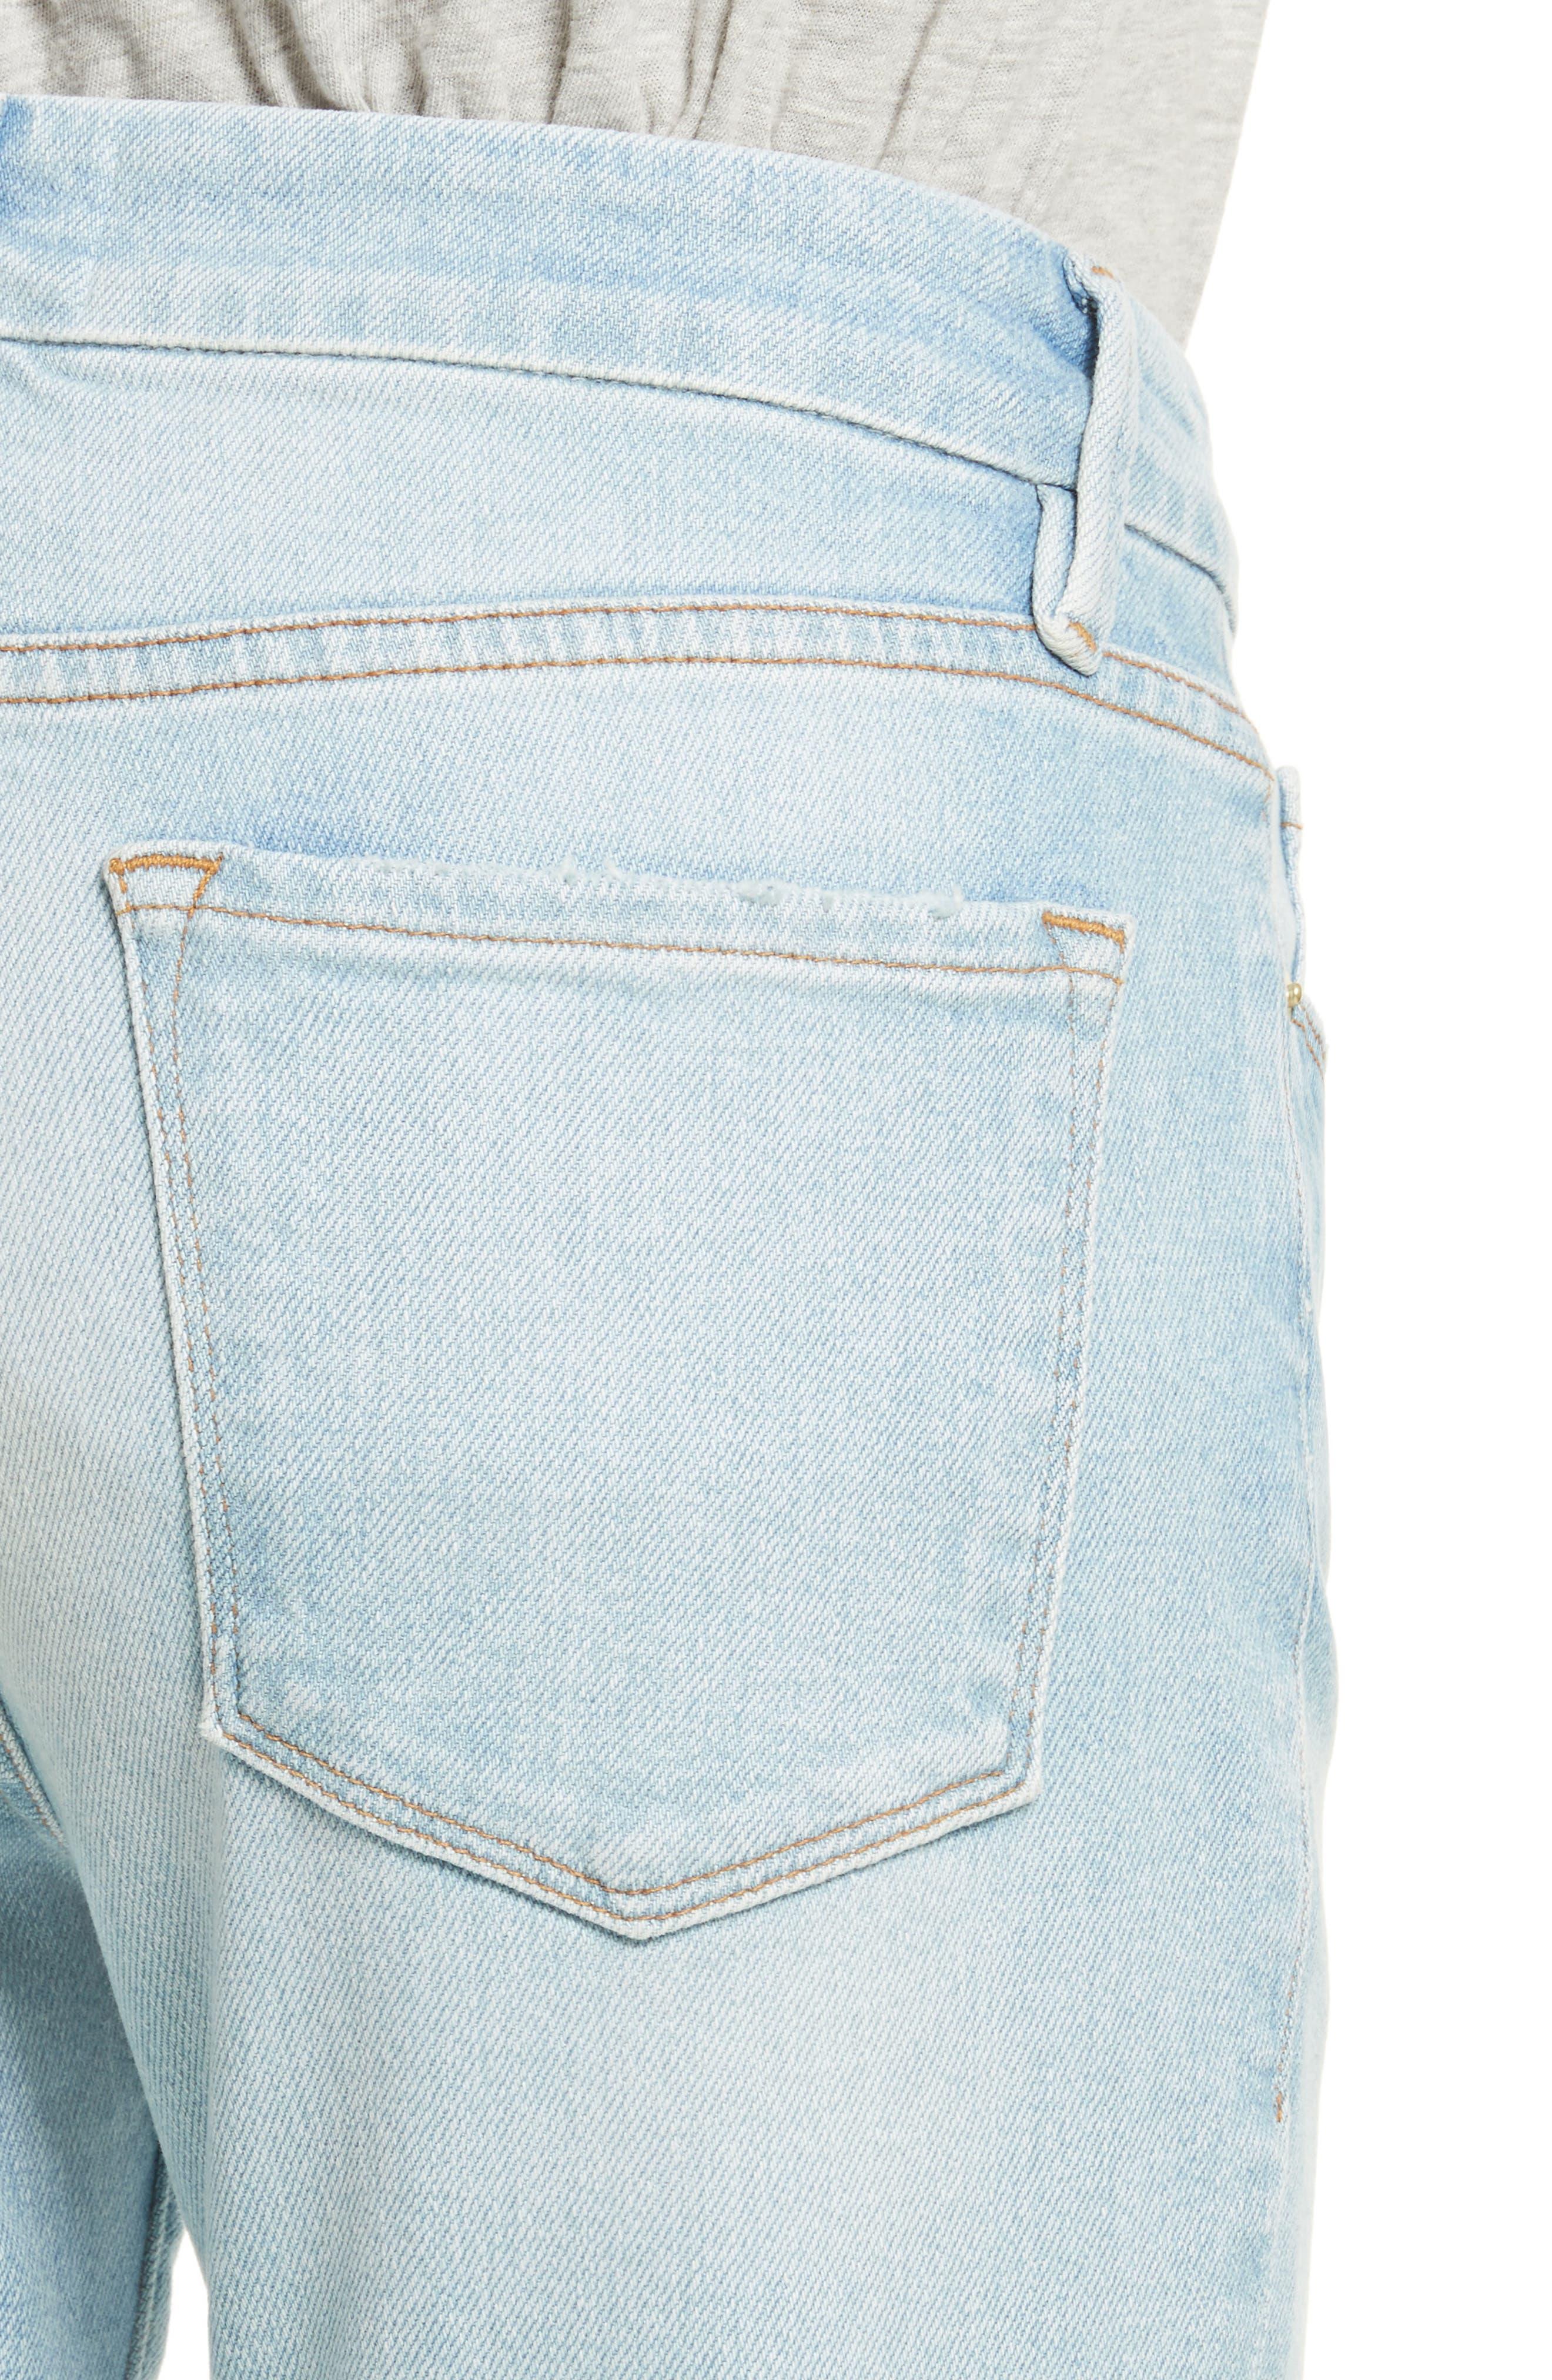 Alternate Image 4  - FRAME Le Crop Mini Boot Jeans (Adeline)